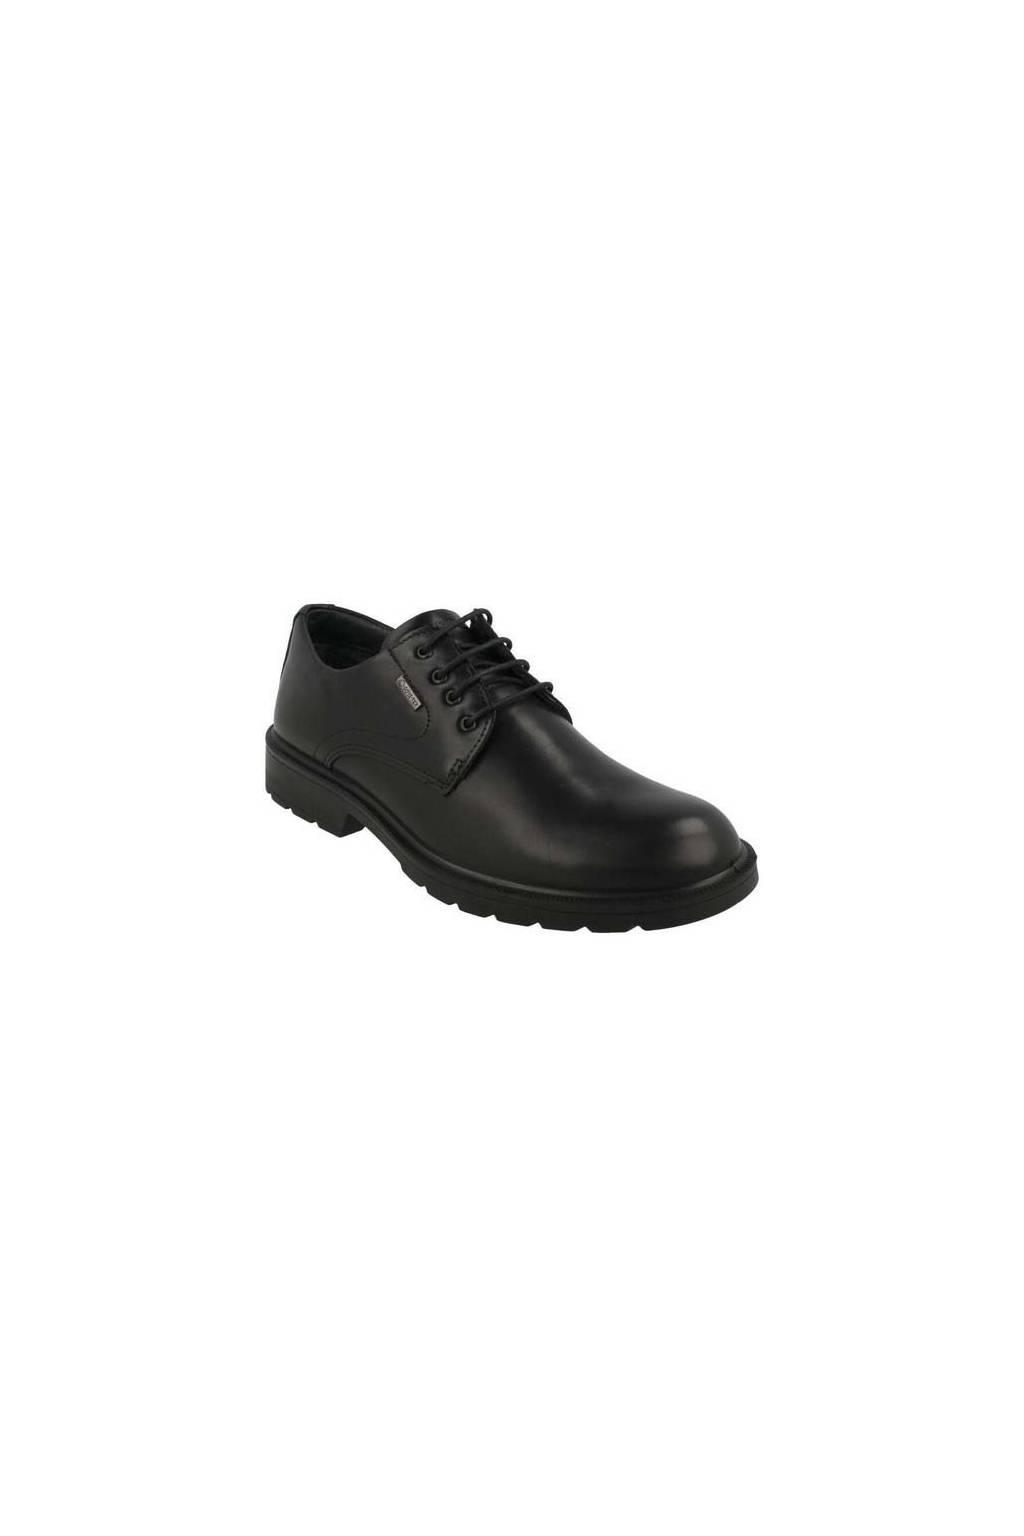 Zapato igi&co  6102500 negro  goretex